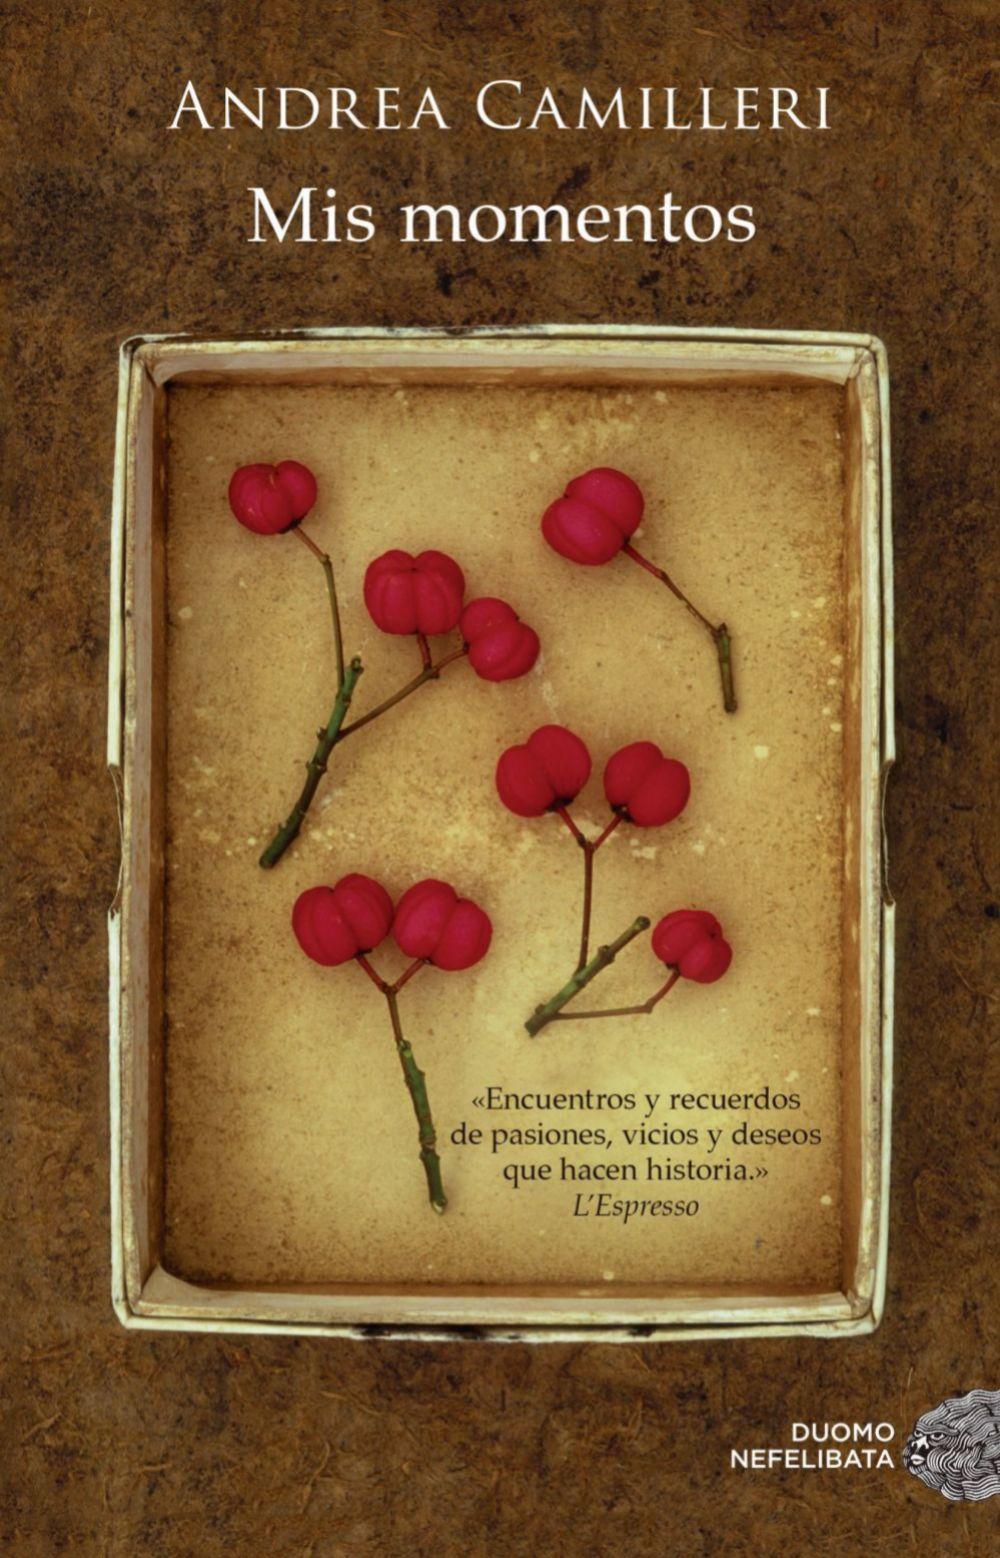 Mis momentos, Andrea Camilleri